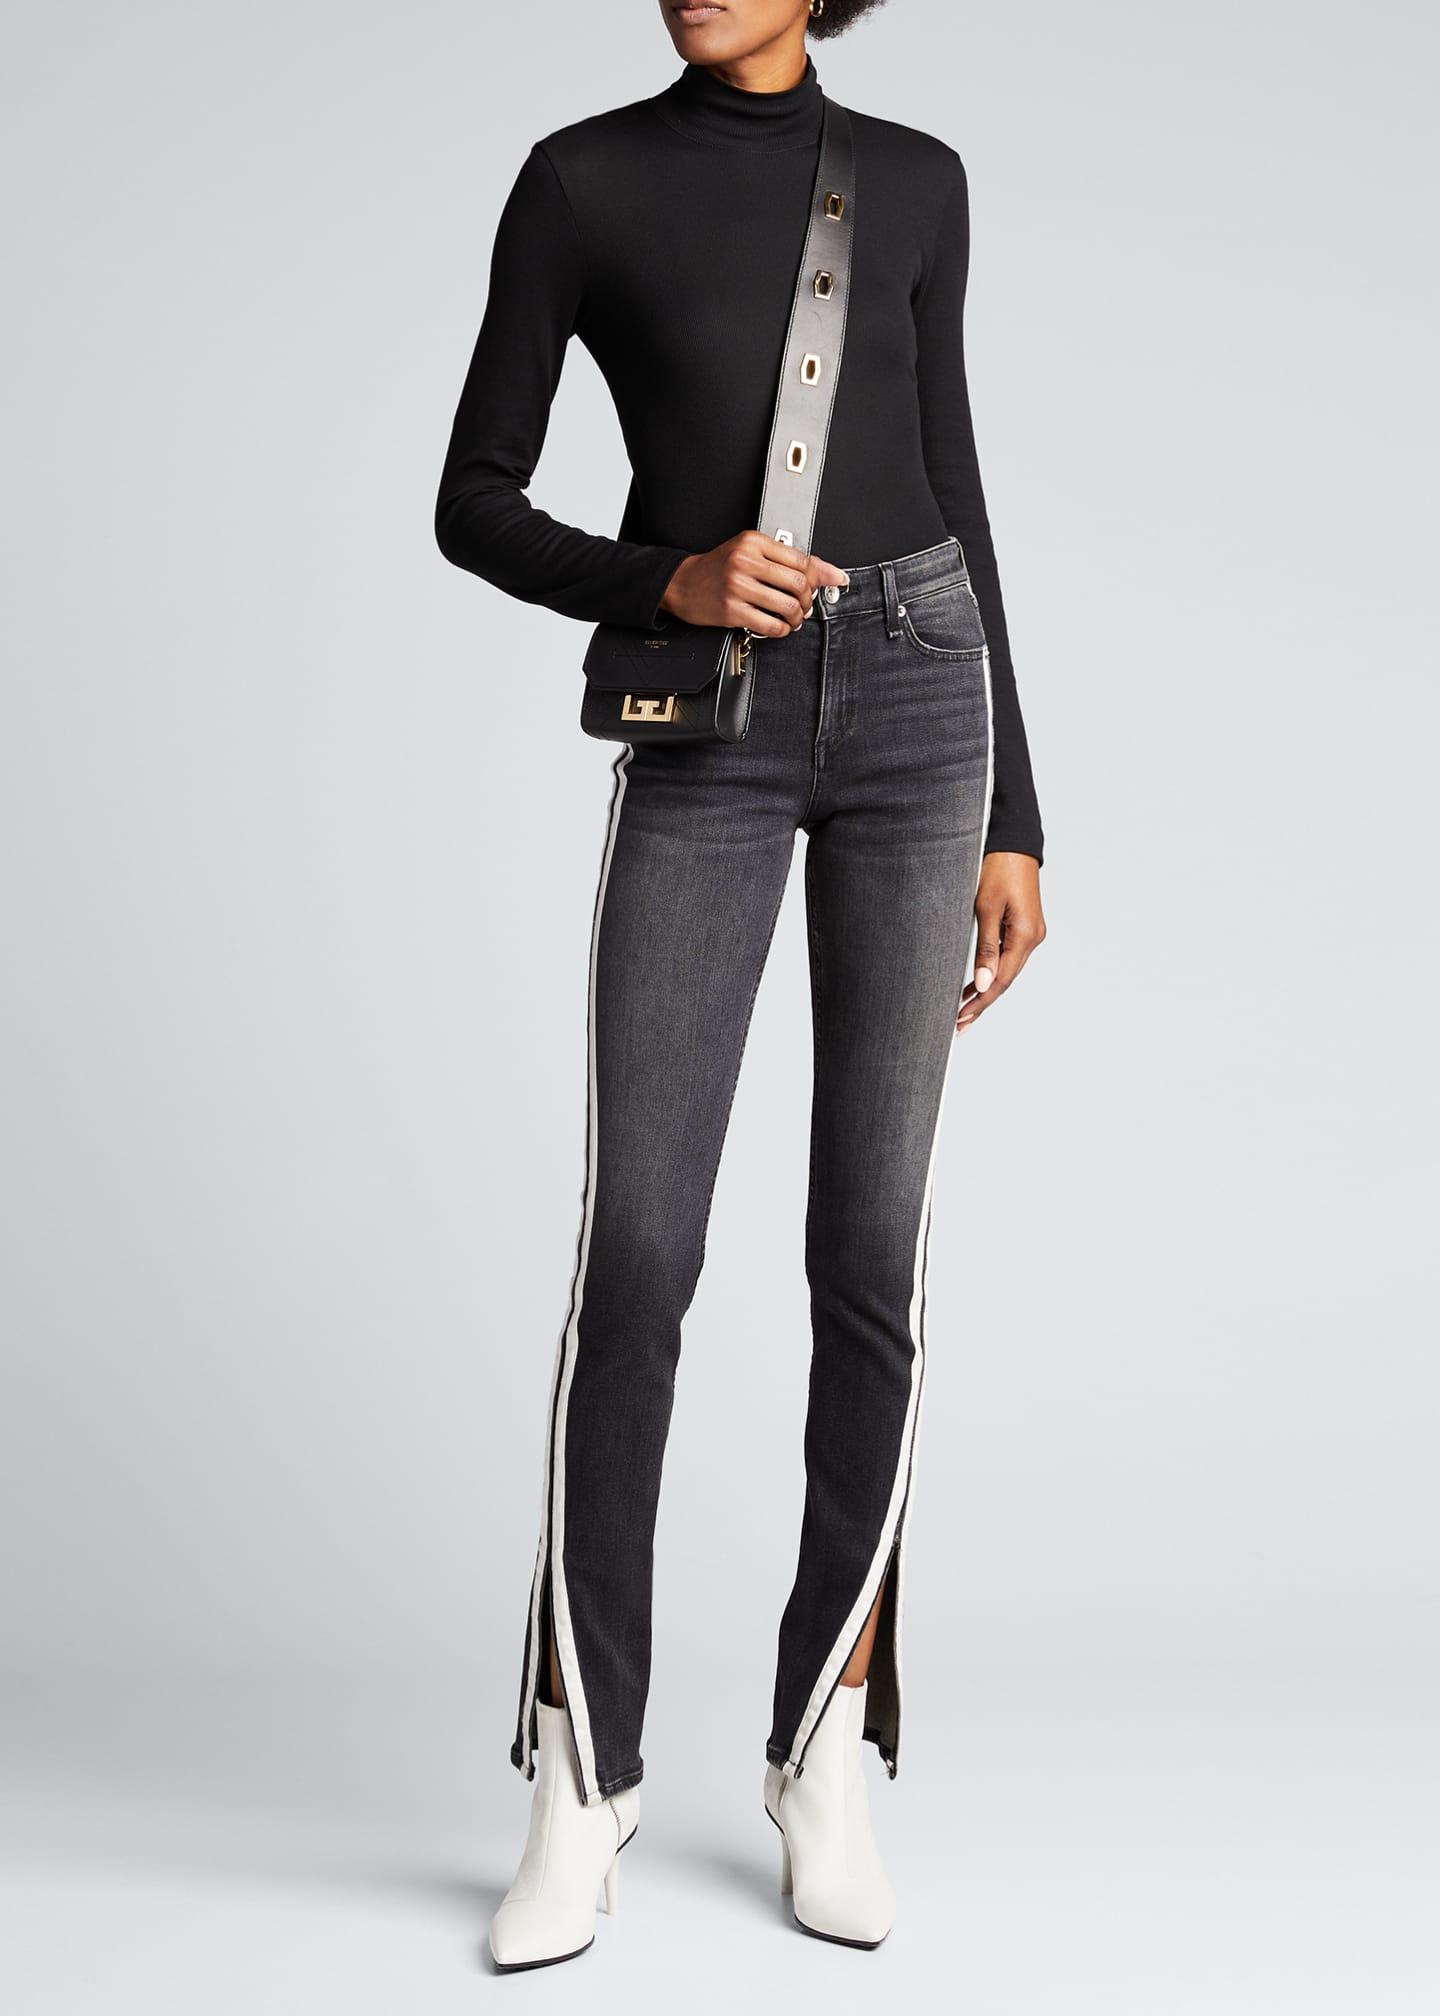 Rag & Bone Cate Mid-Rise Flare Jeans